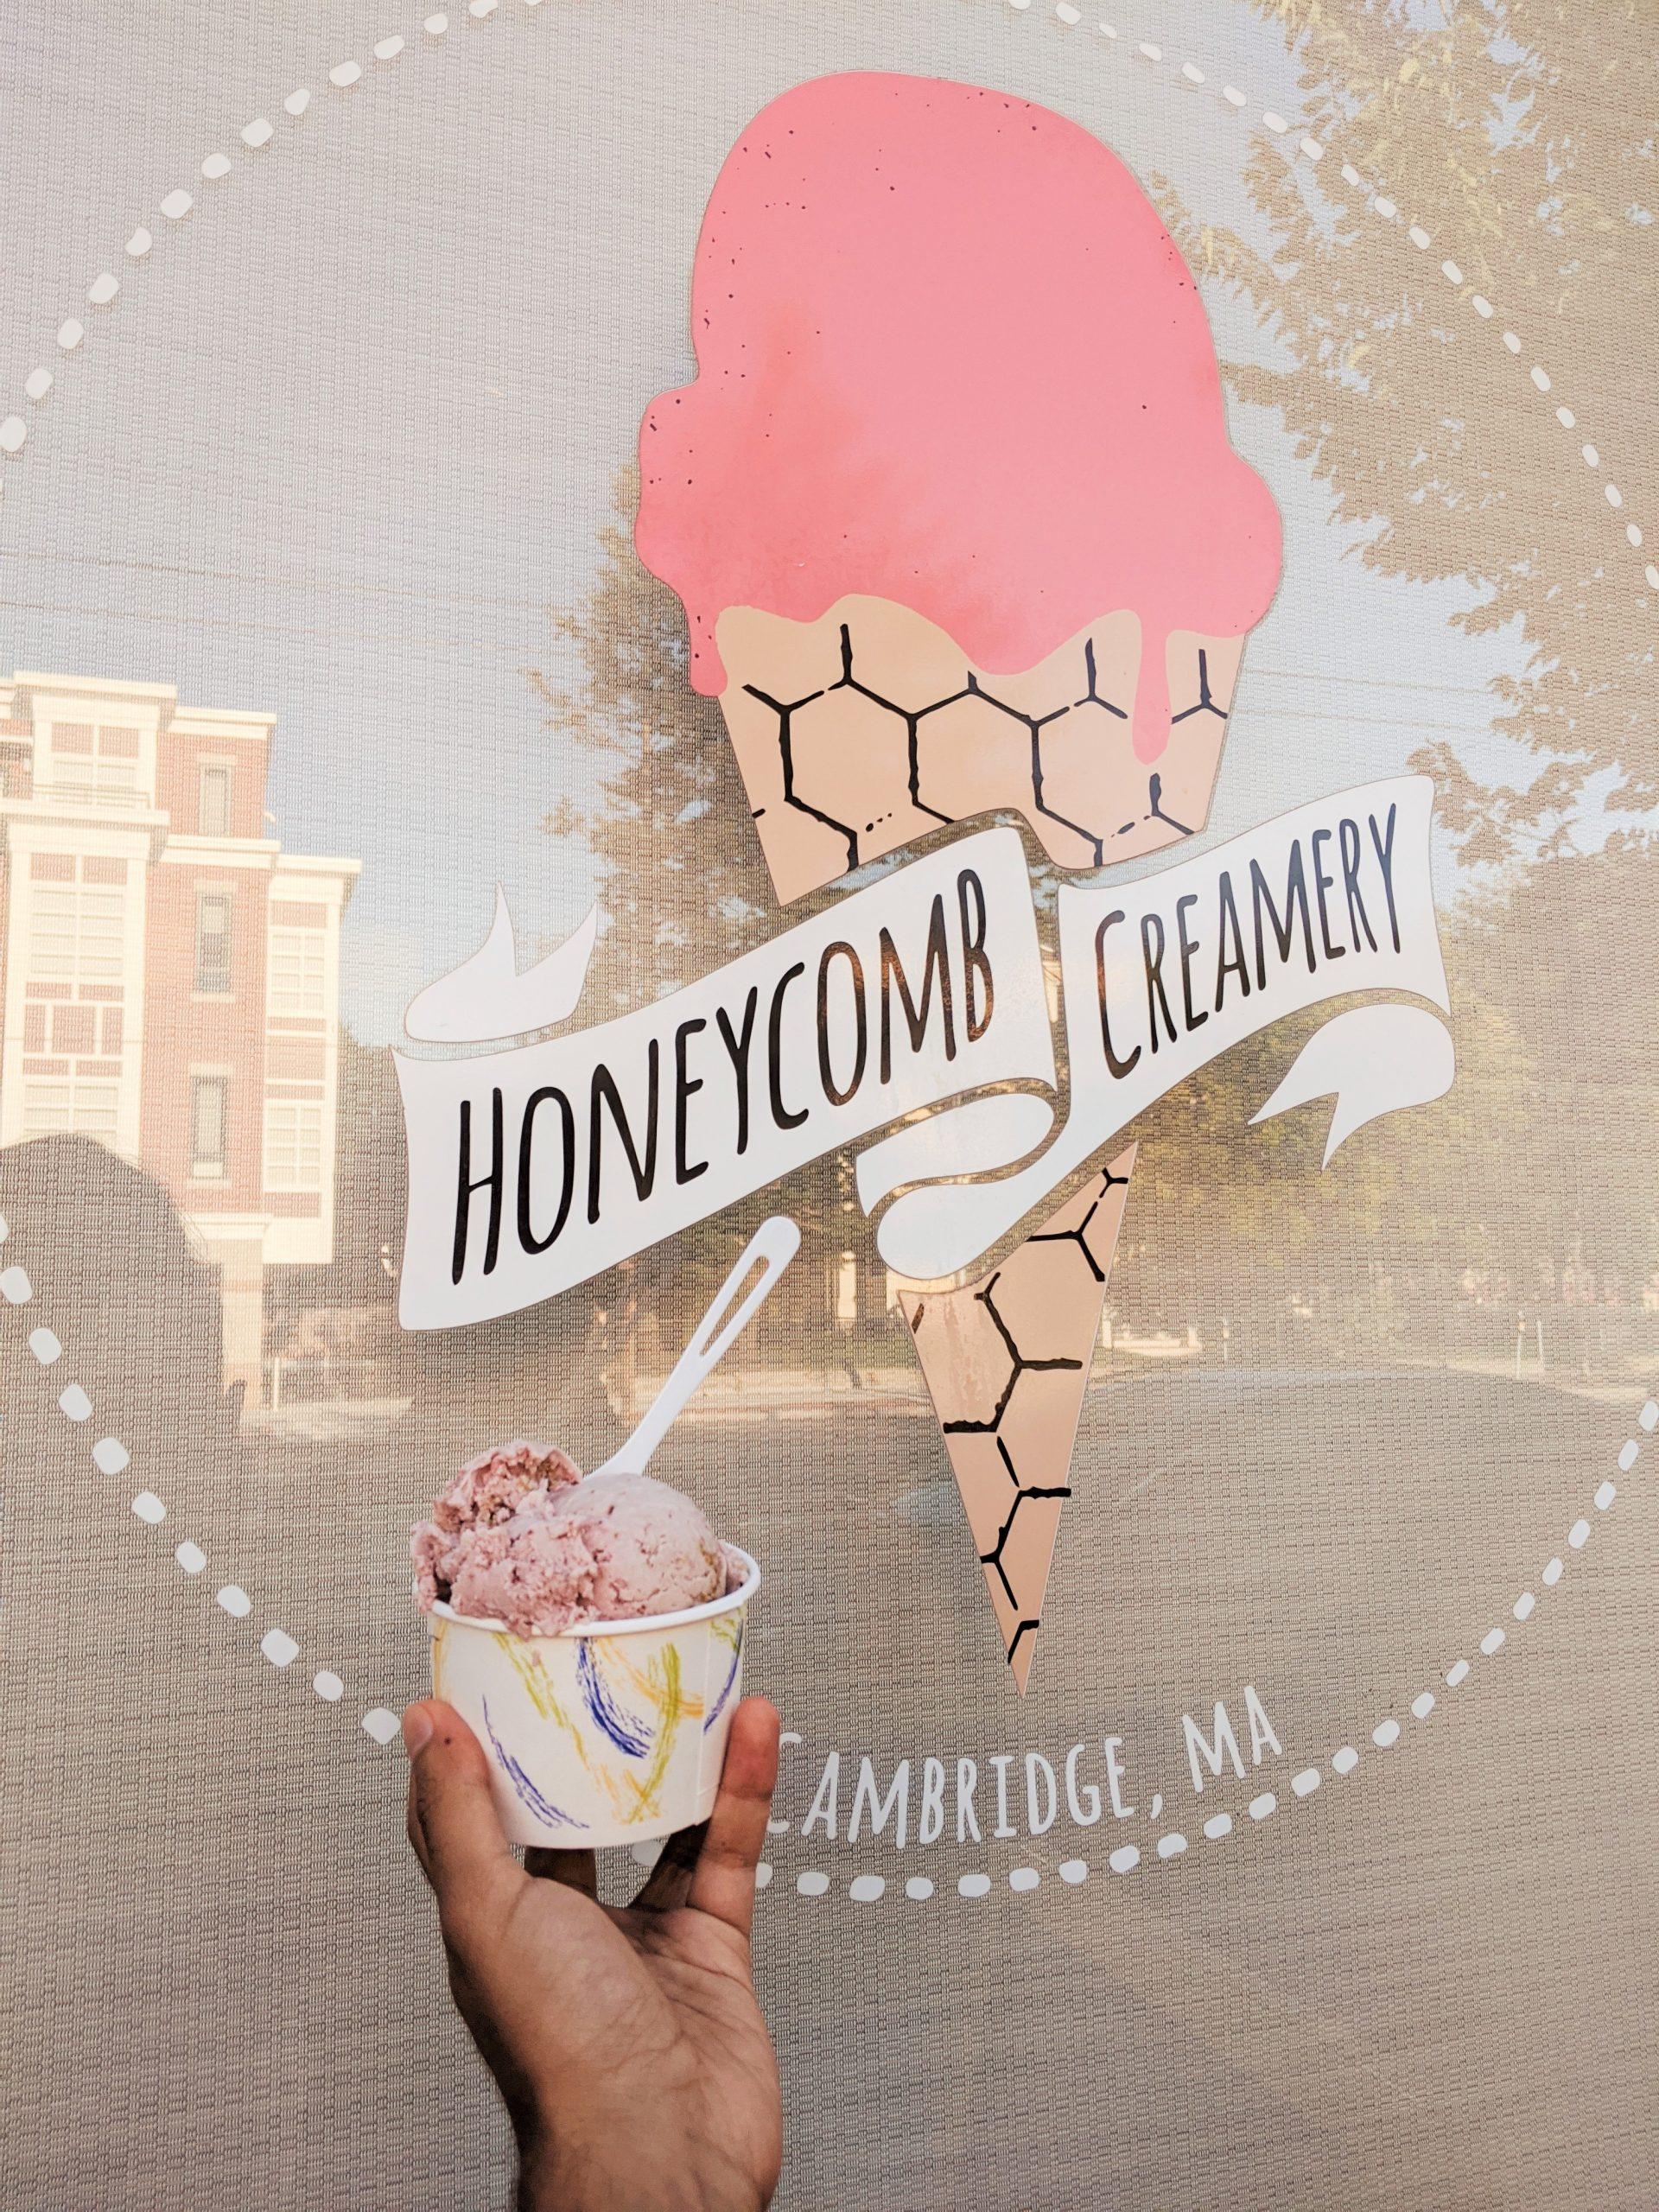 Honeycomb Creamery storefront and vegan ice cream